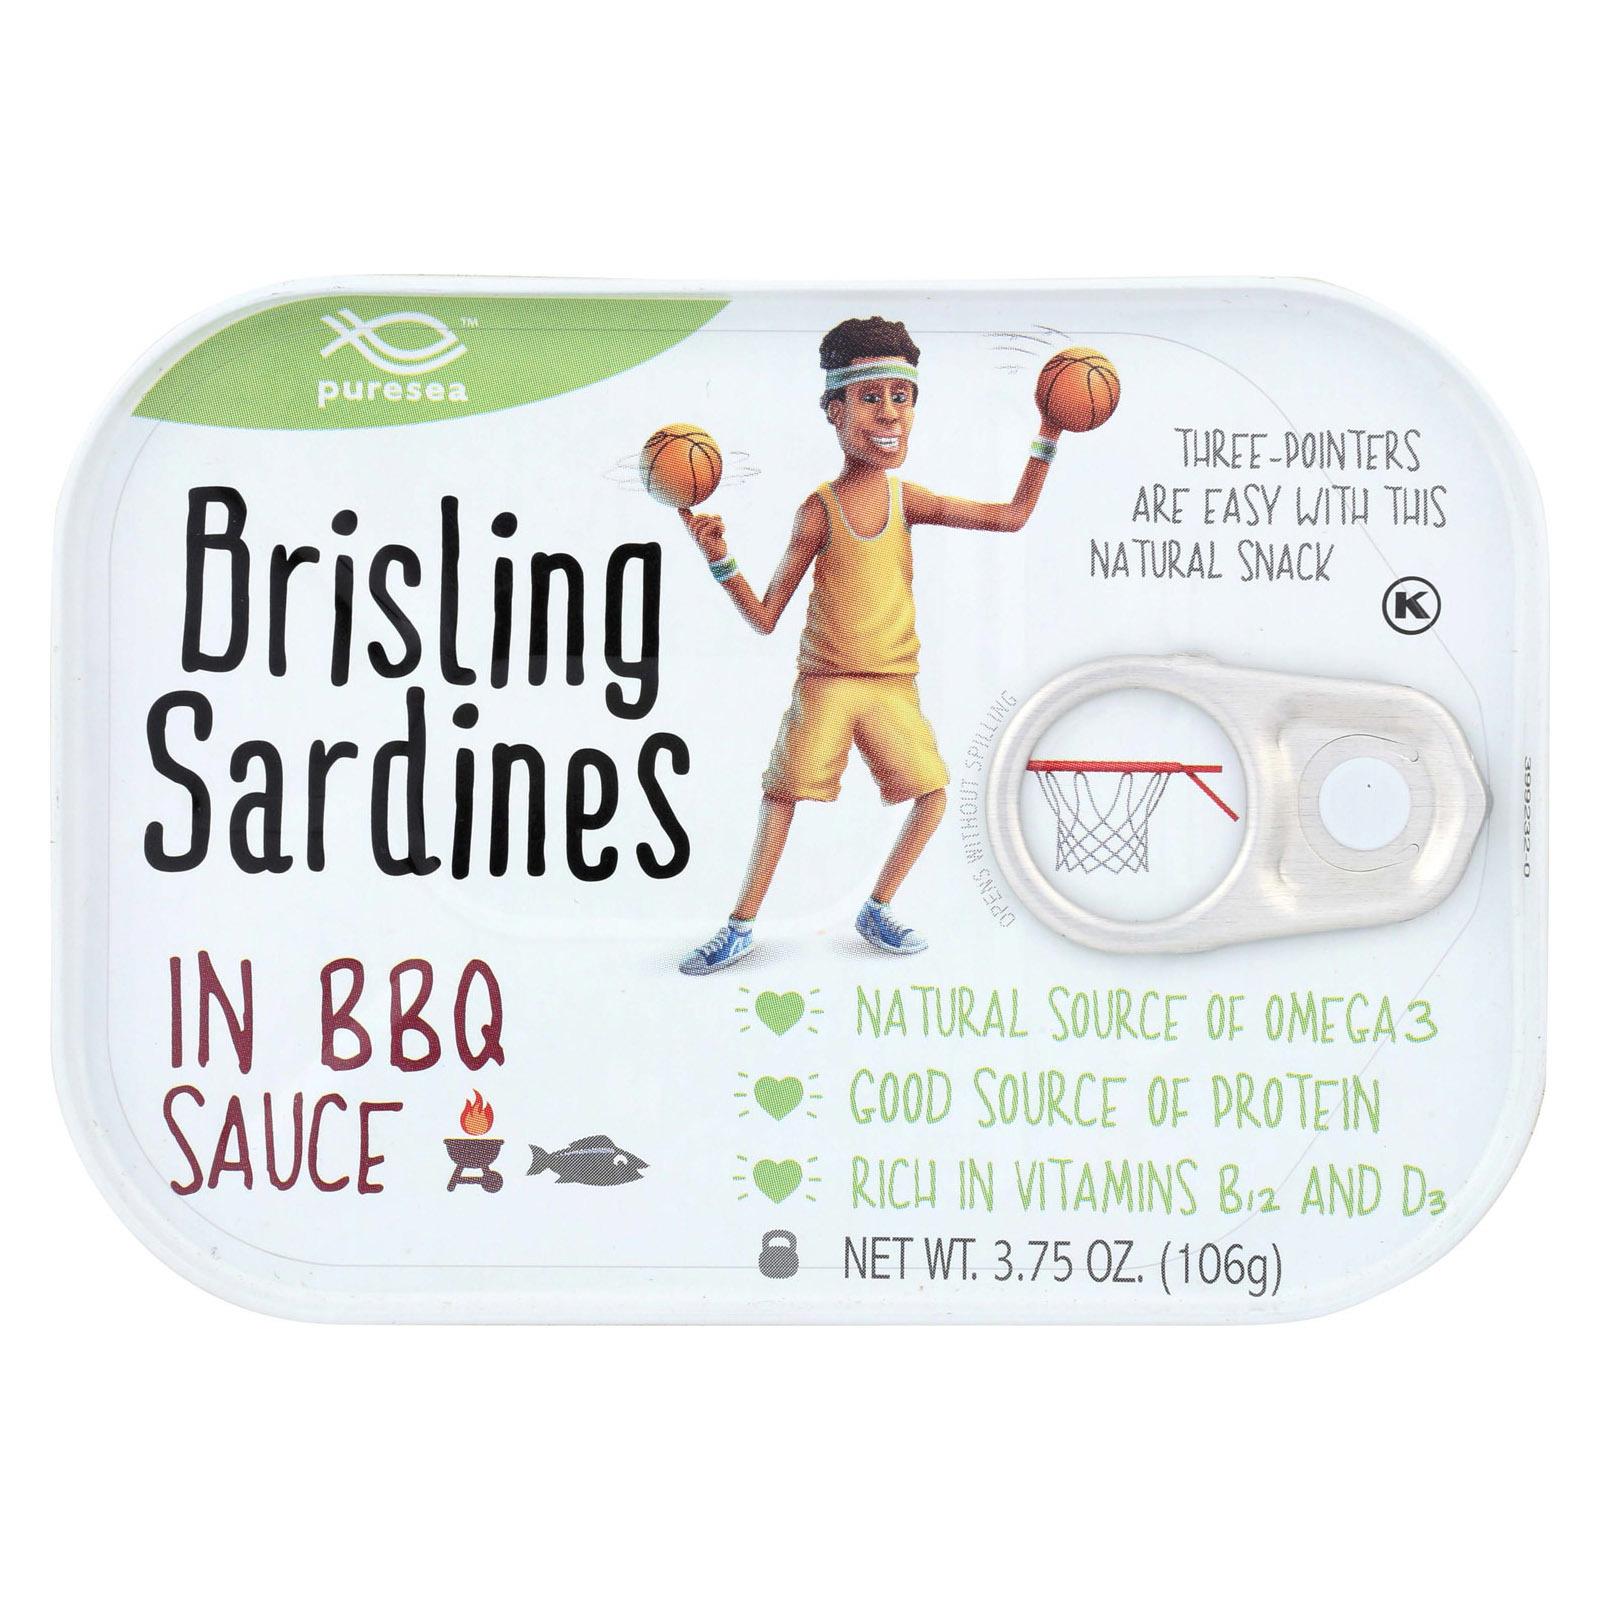 Pure Sea Sardines - Brisling - BBQ - Case of 12 - 3.75 oz